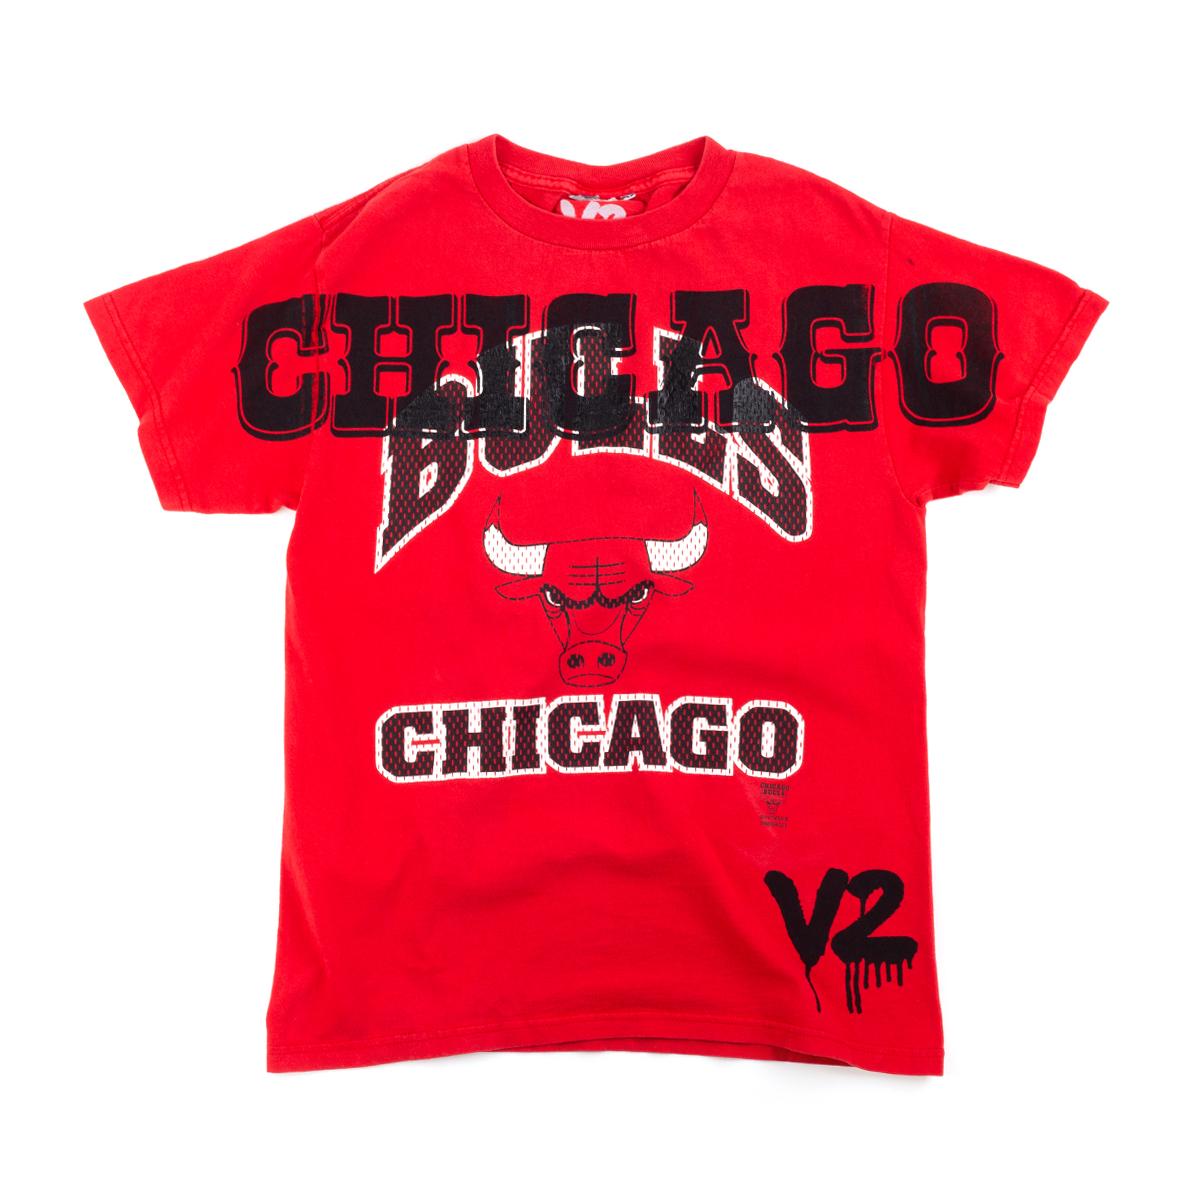 Chicago T-Shirt (M)